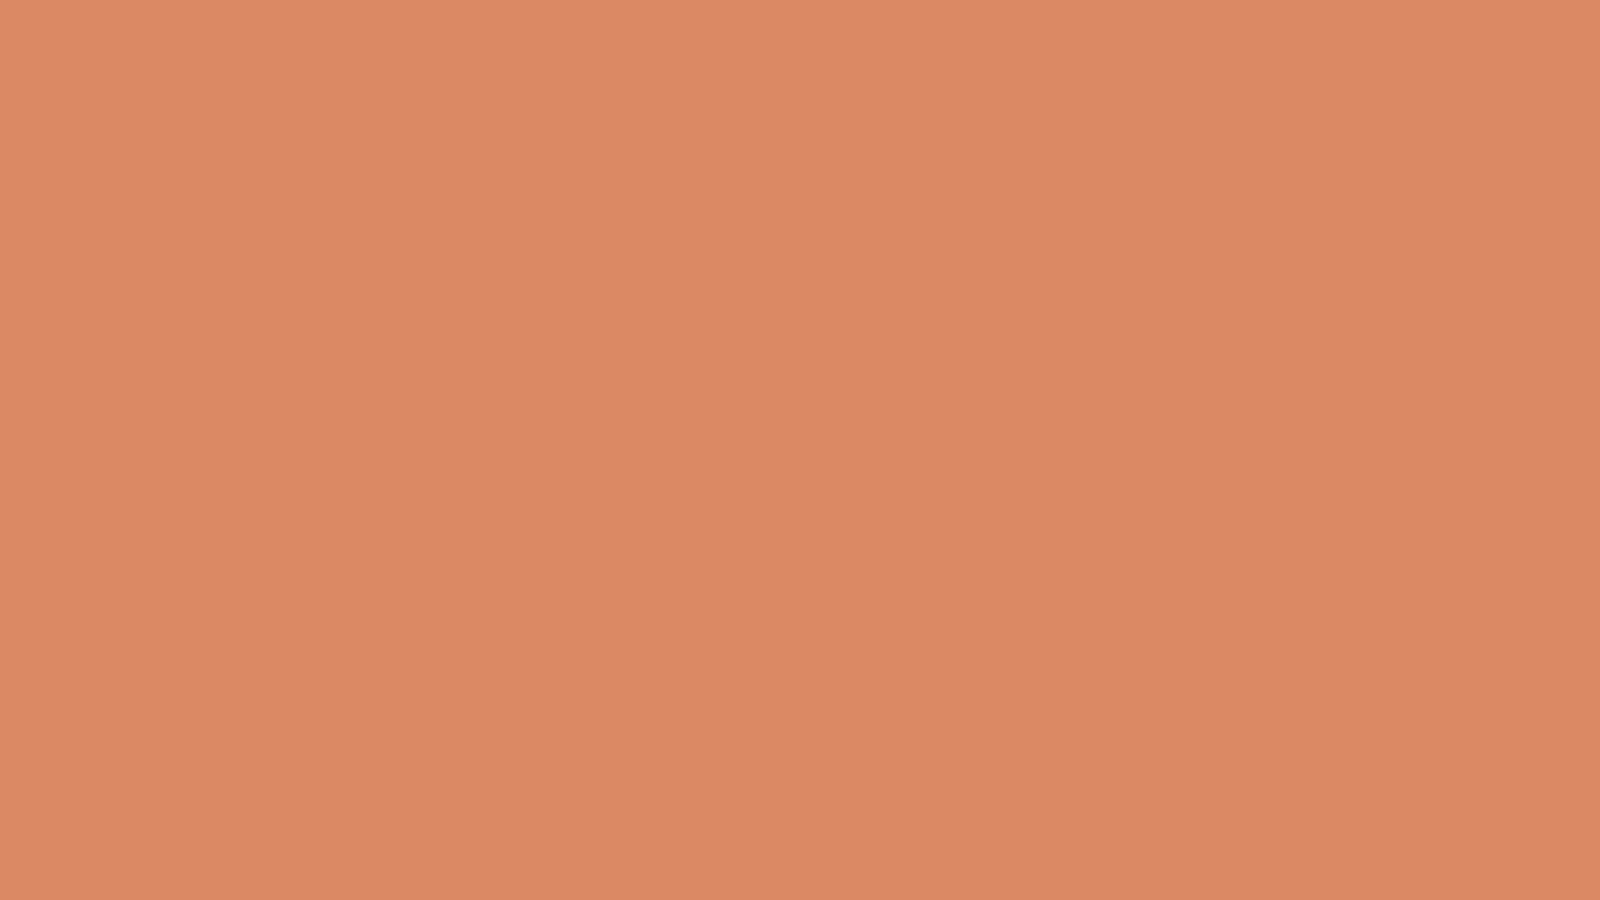 1600x900 Copper Crayola Solid Color Background